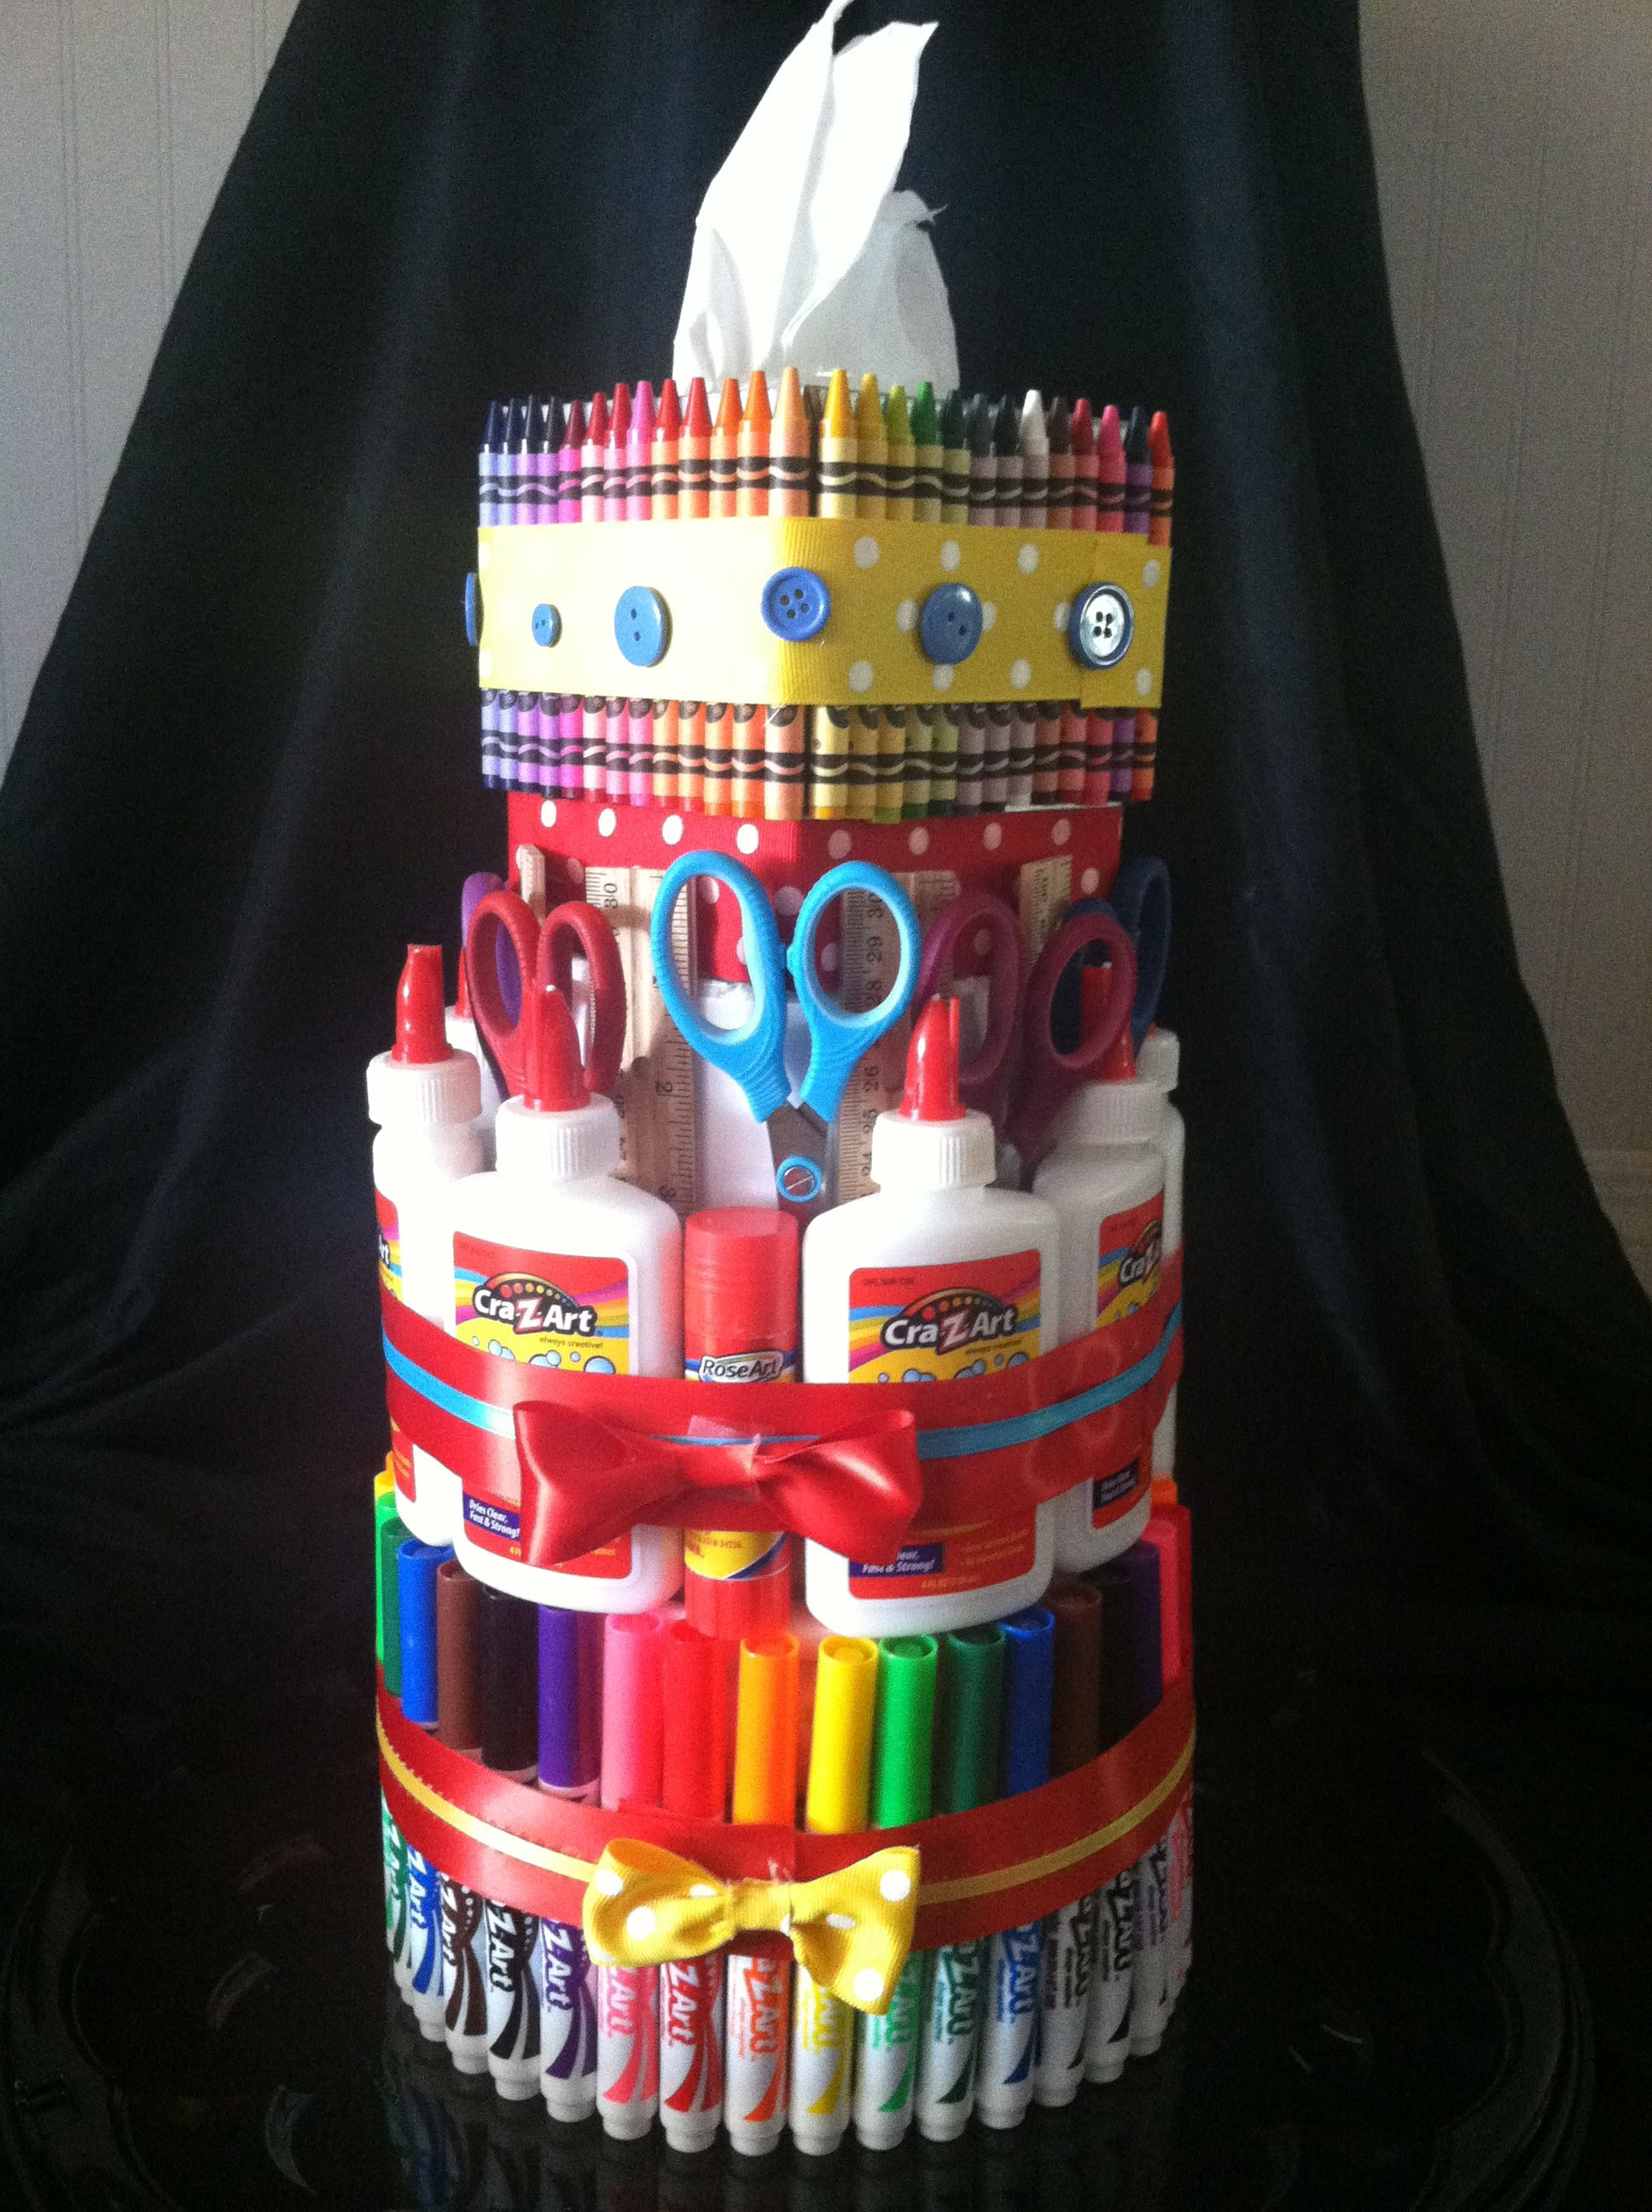 School Supply Cake | I Did It! (Pinterest Projects) | Pinterest ...